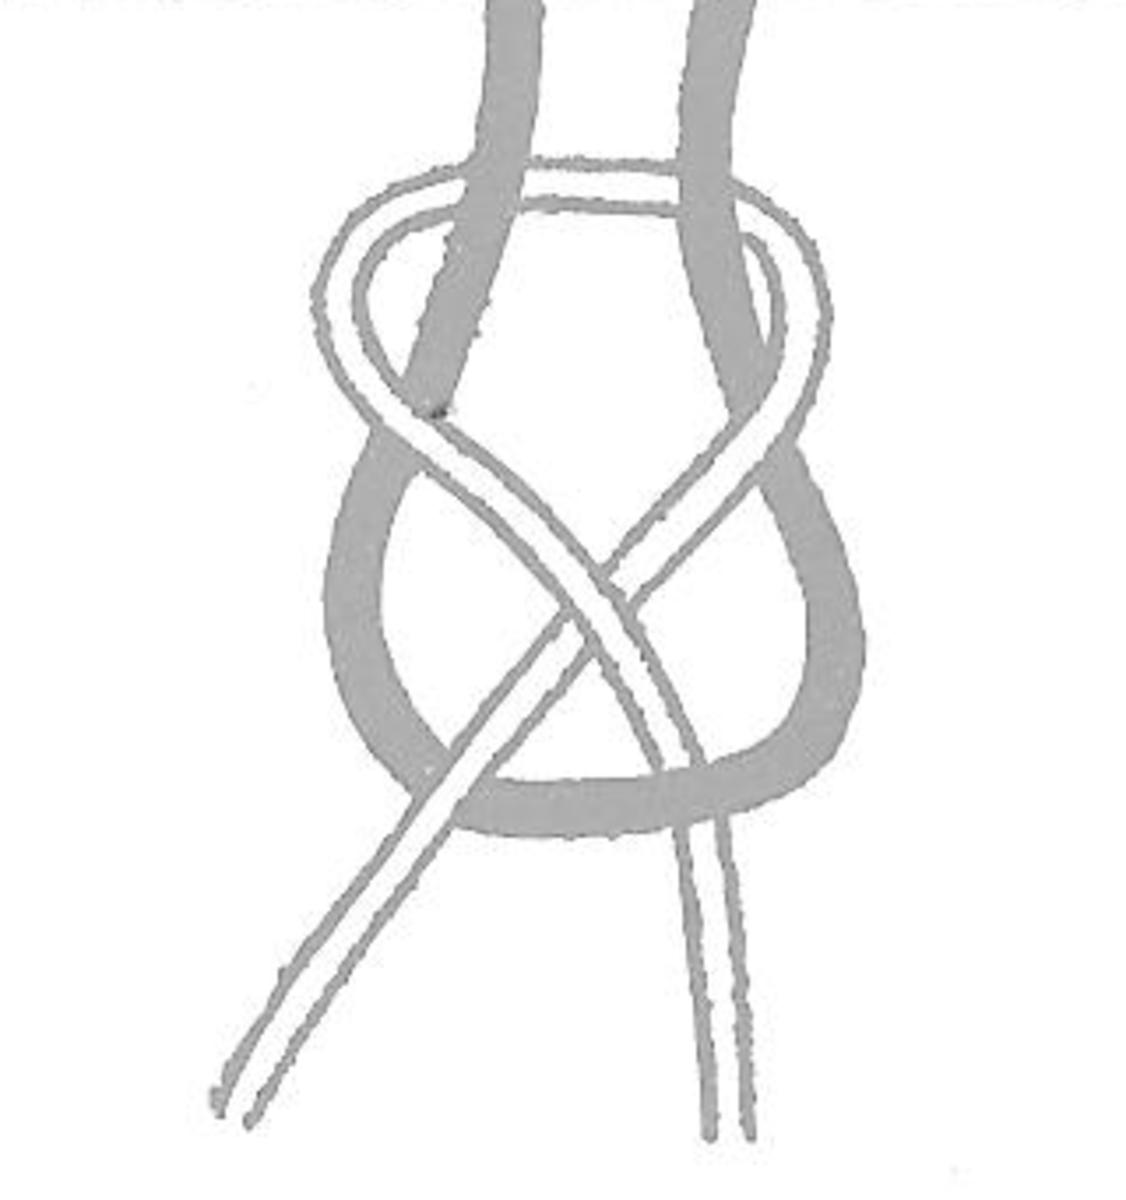 Figure 2 - The Hammock Knot